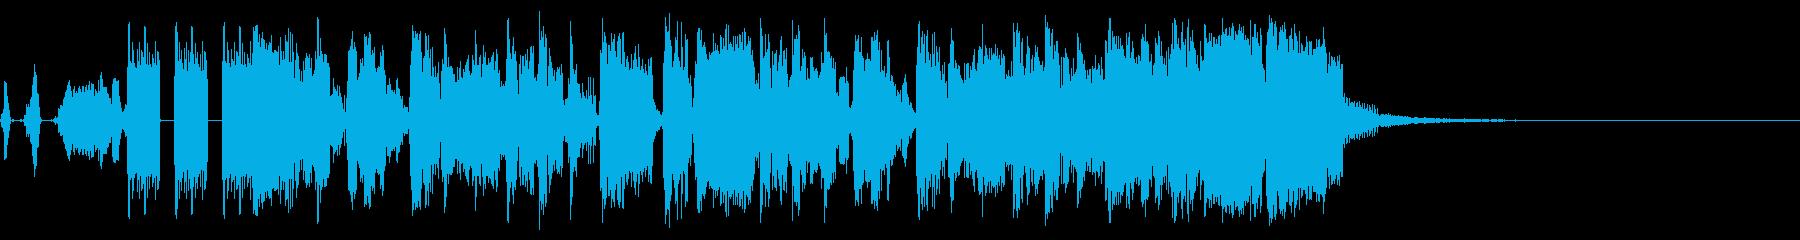 BMXストリートの再生済みの波形